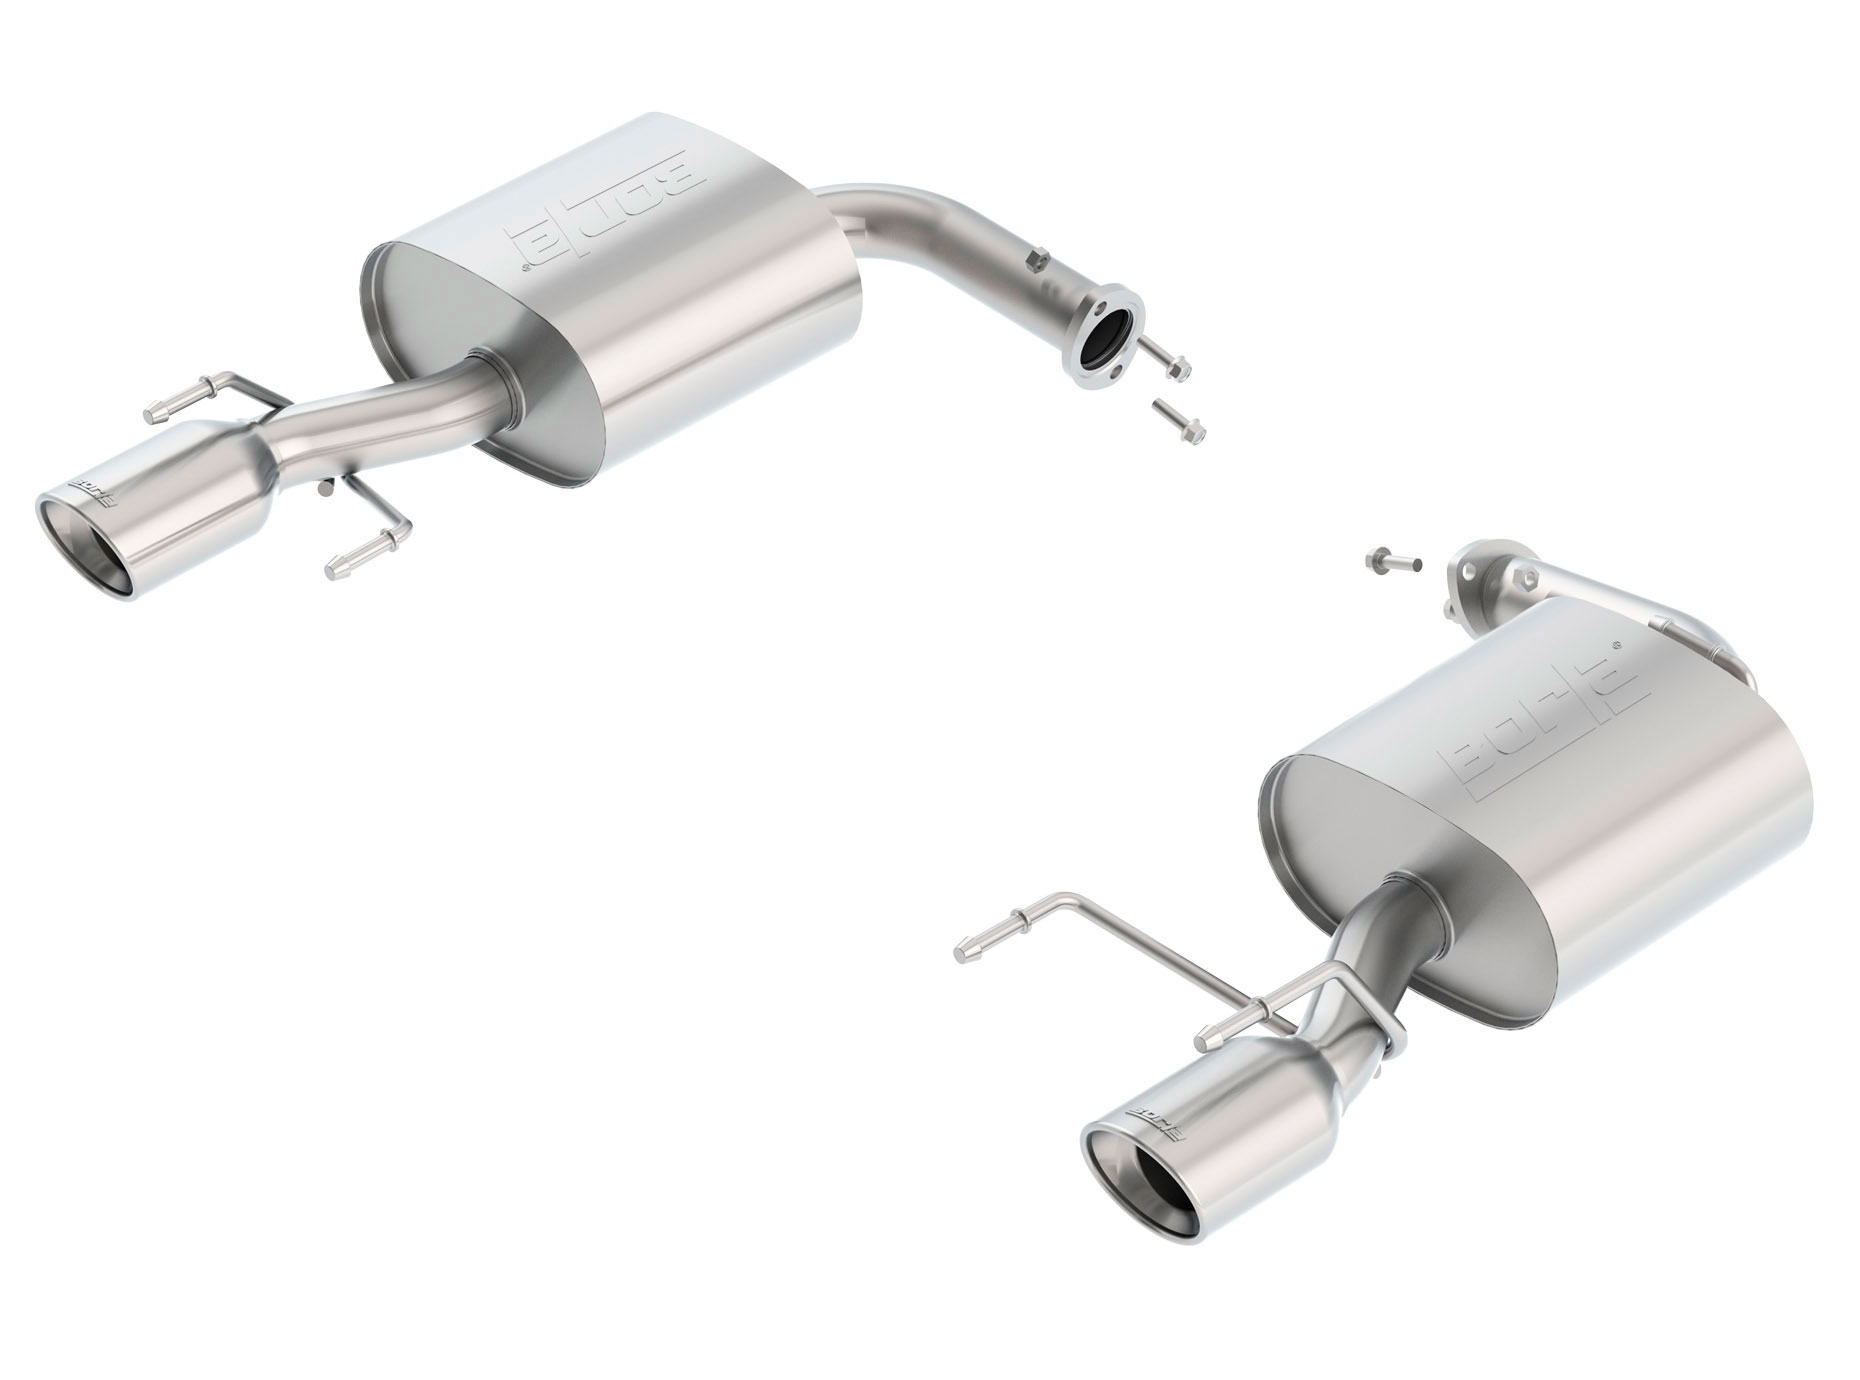 borla 11916 toyota camry exhaust system lm performance